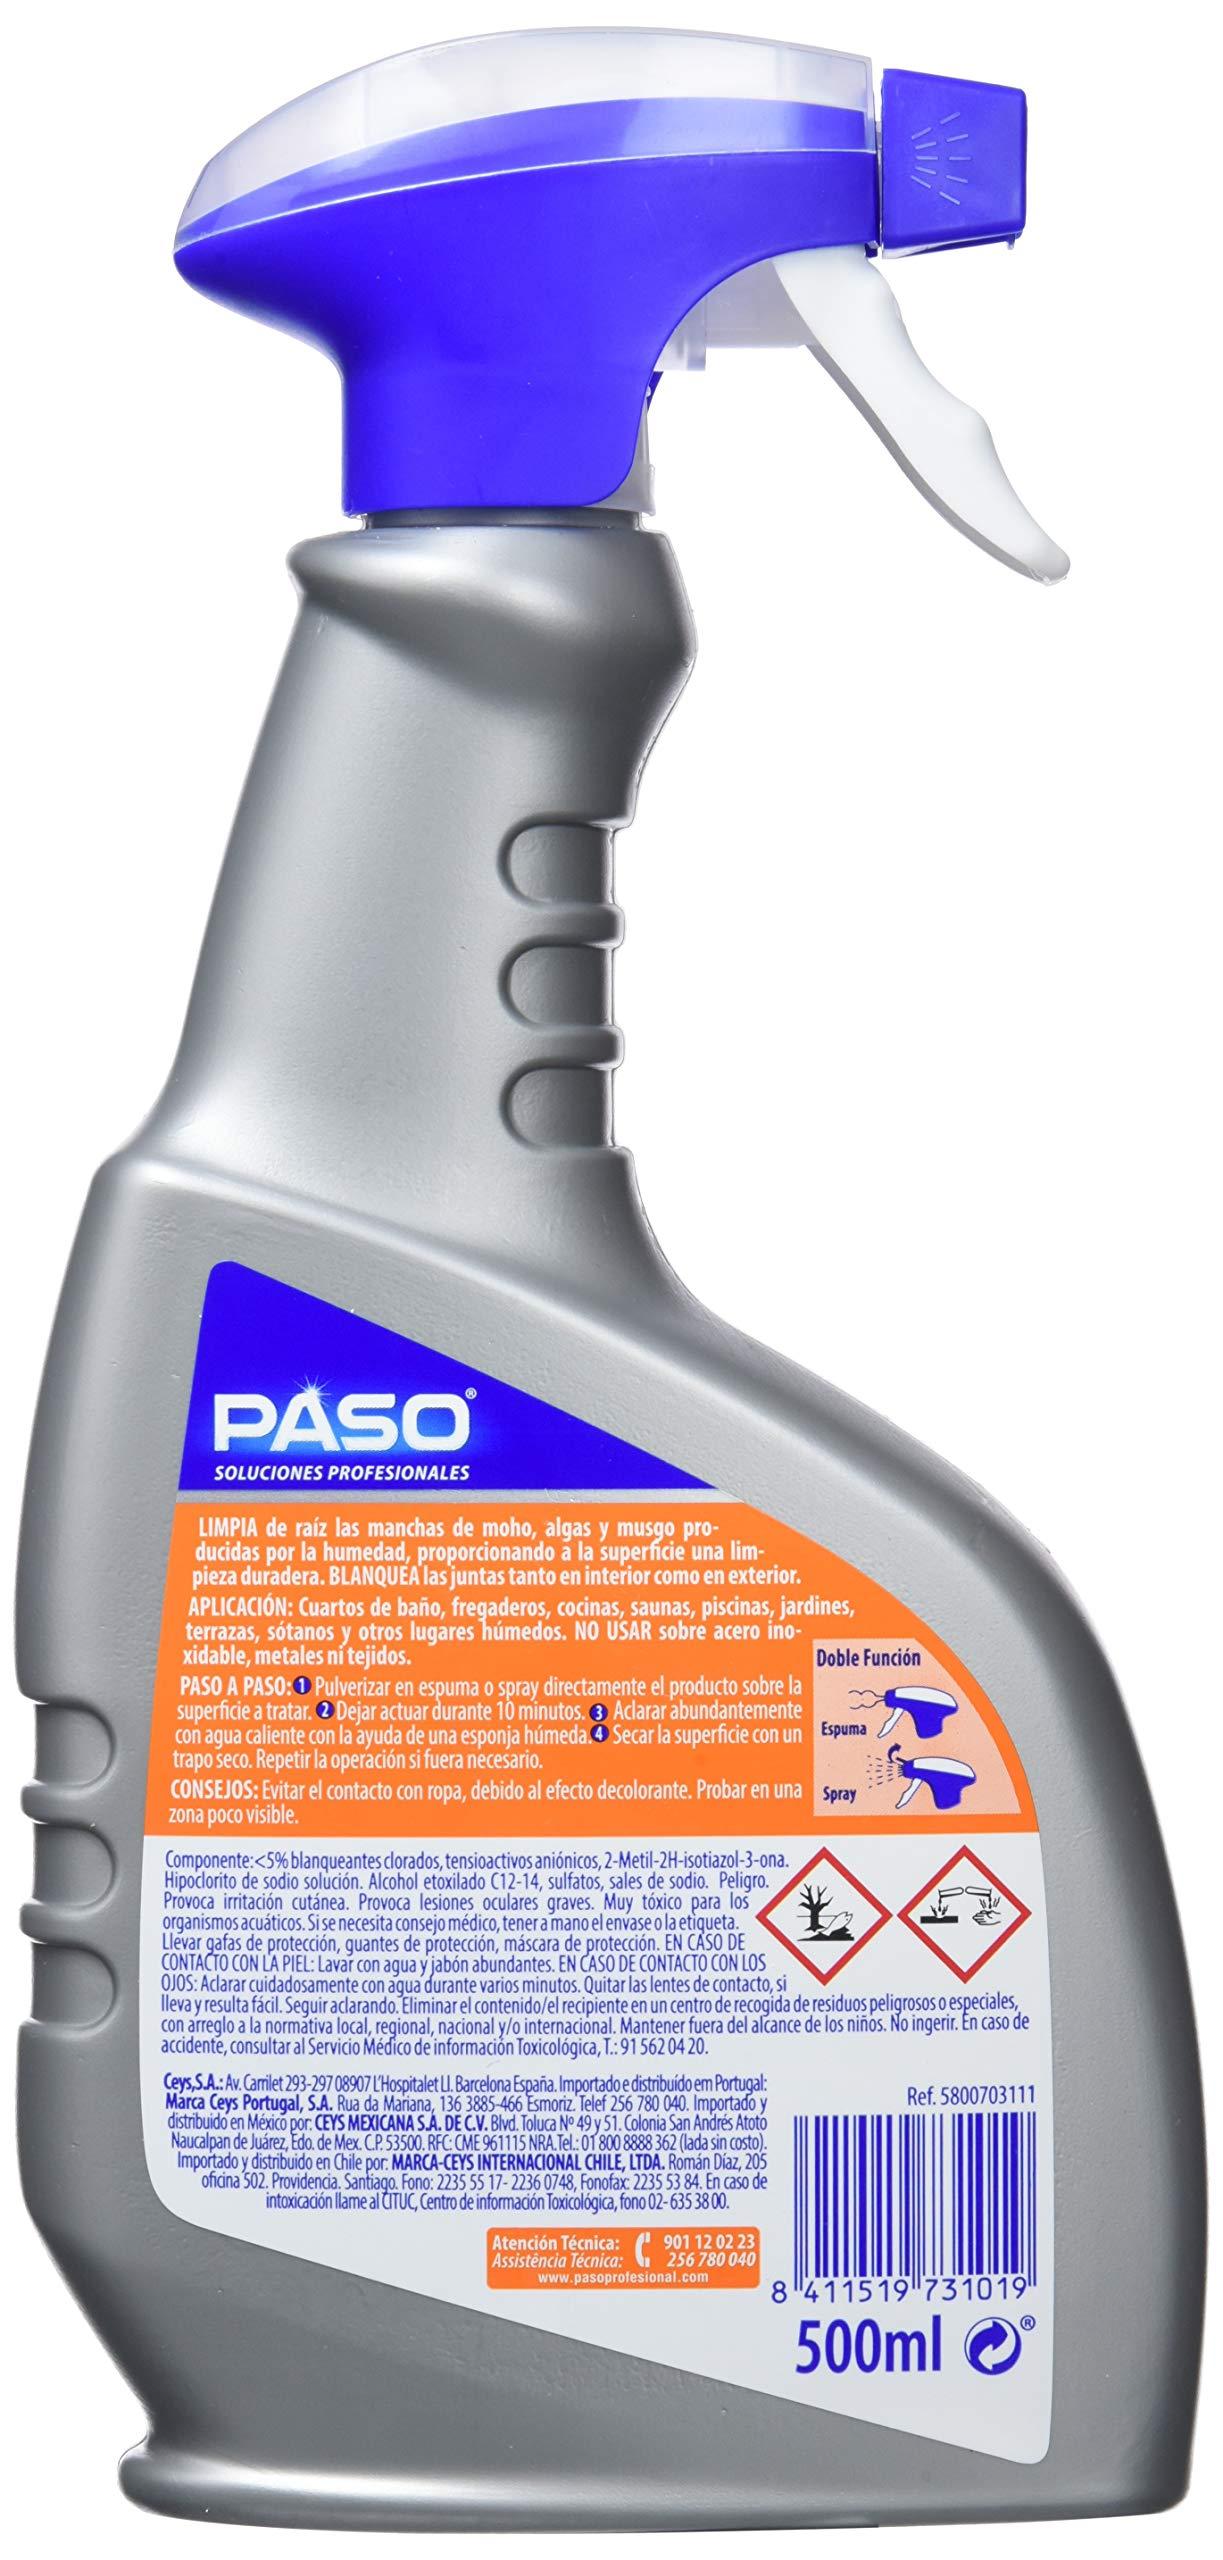 Paso Limpiador Moho, Hipoclorito de Sodio, Gris, 12.5x4x25.5 cm ...